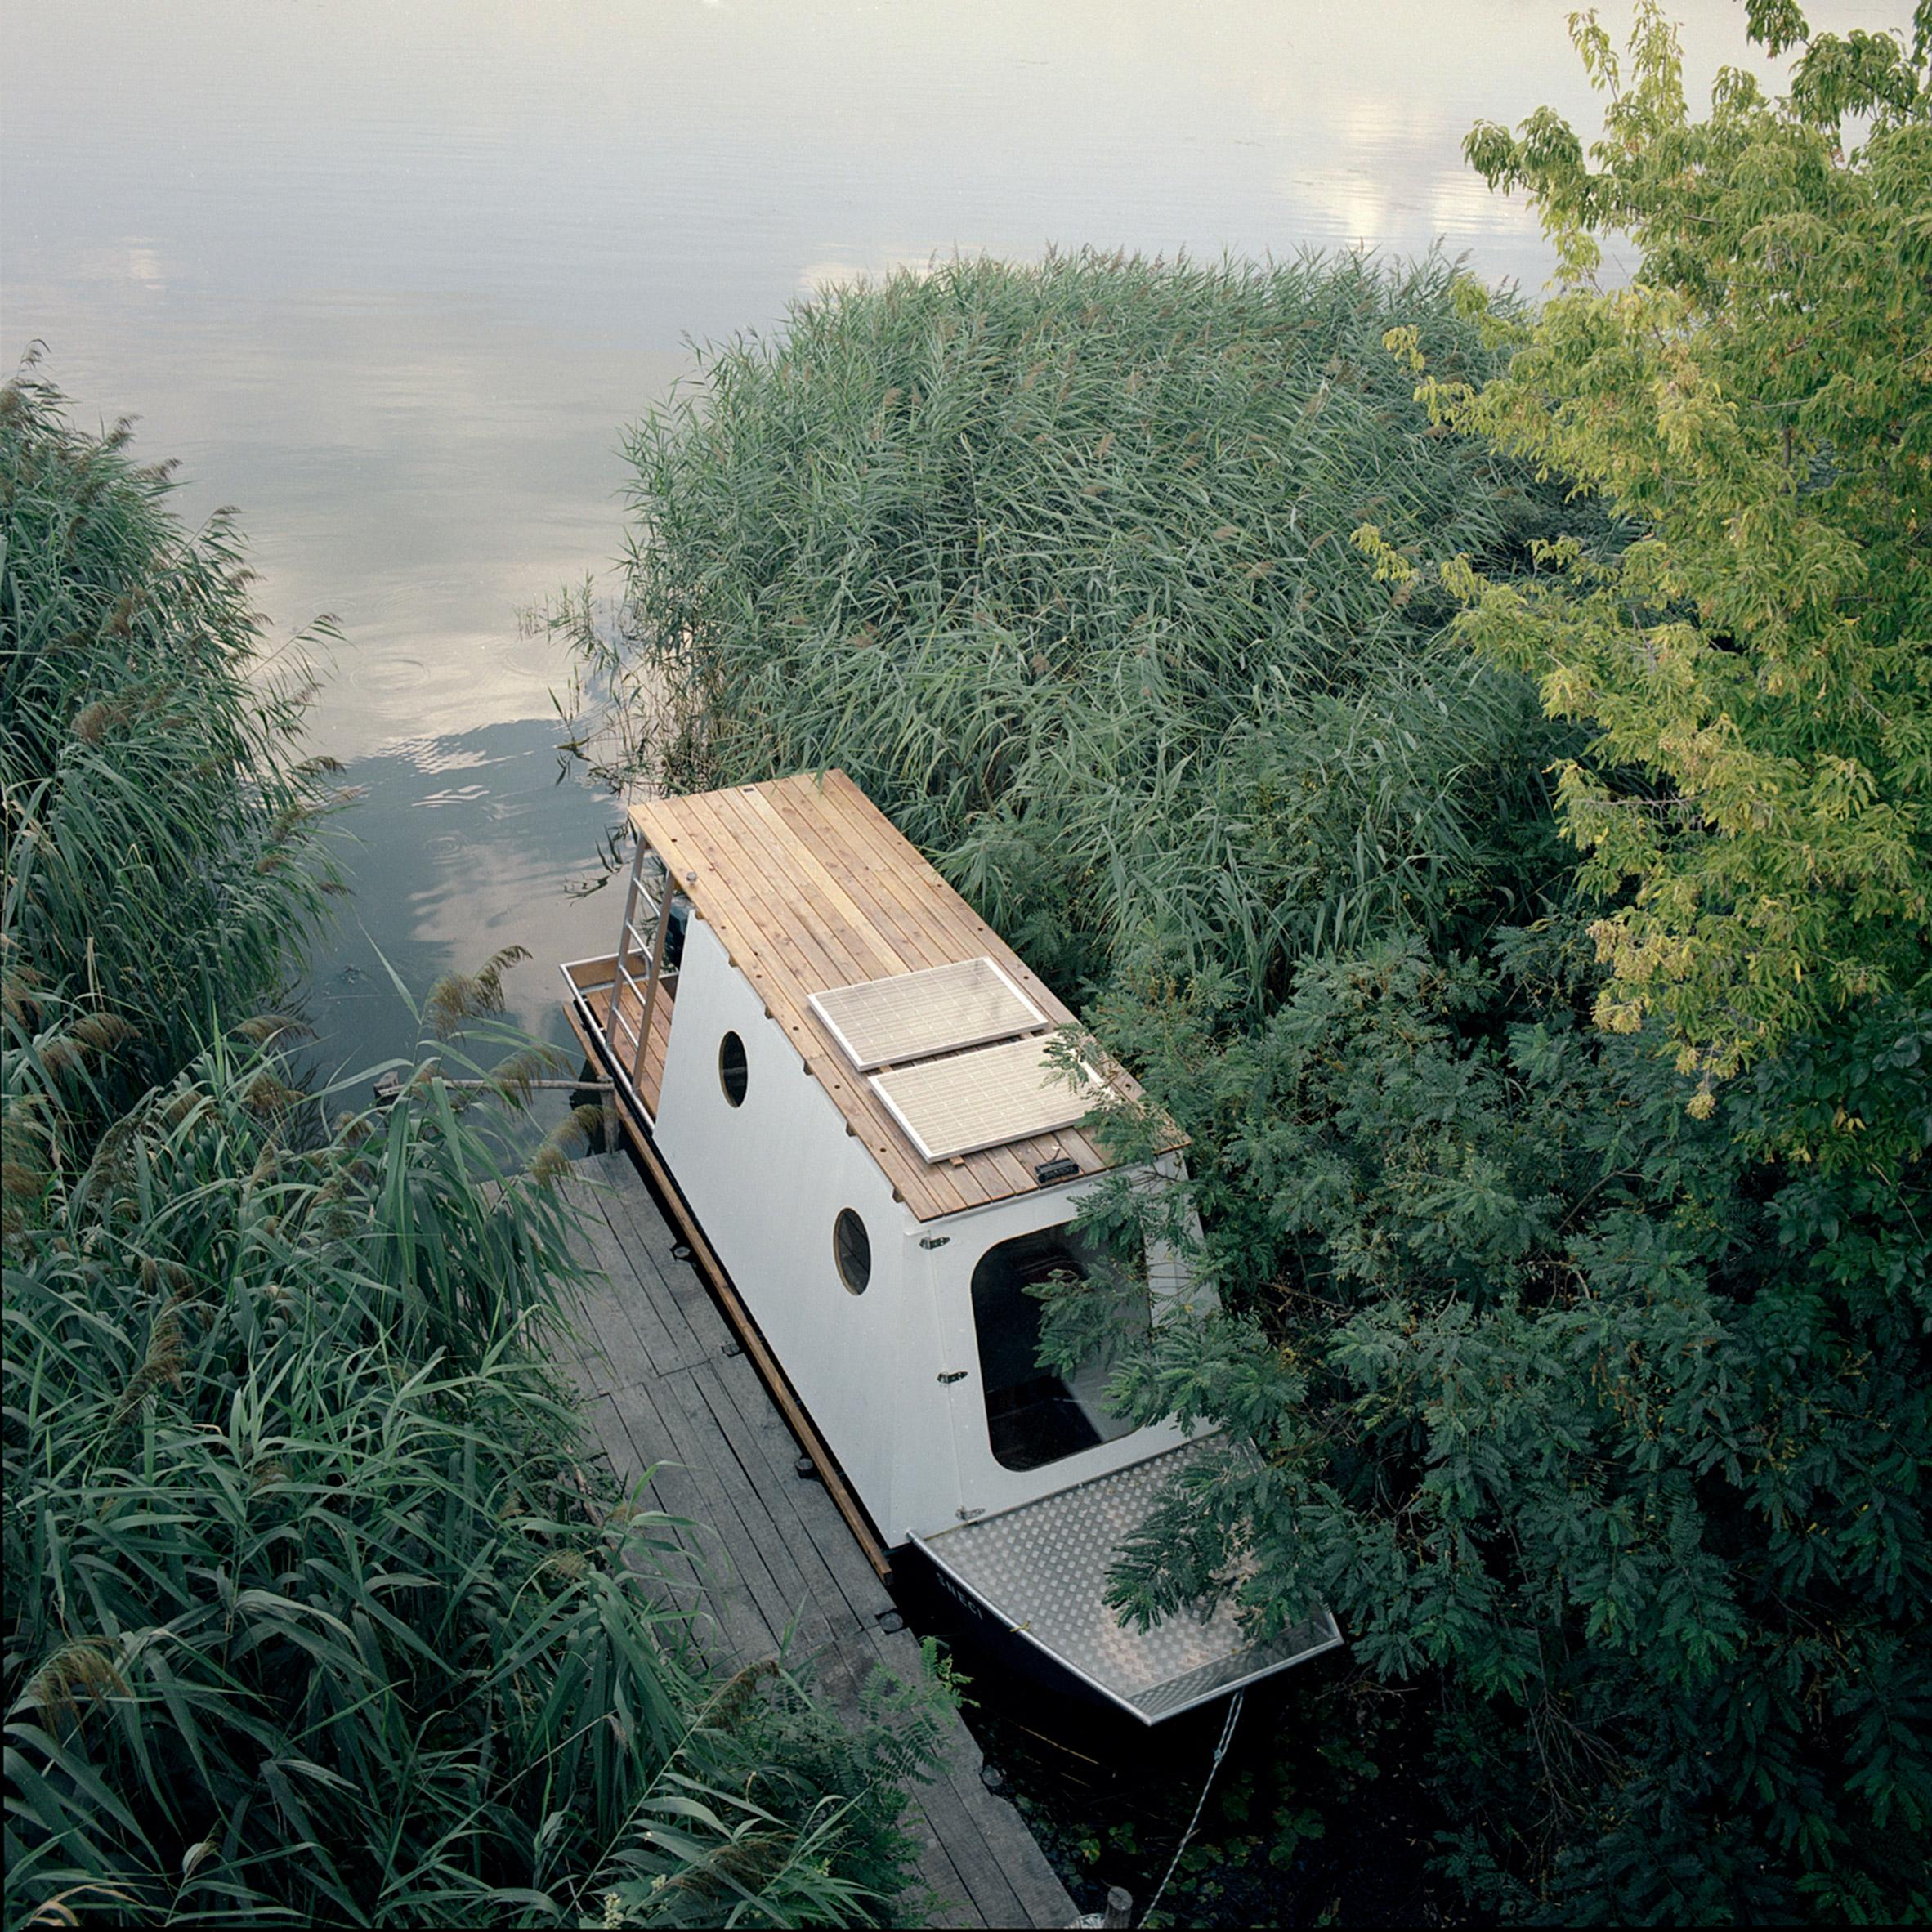 Birdseye view of Sneci houseboat by Tamás Bene